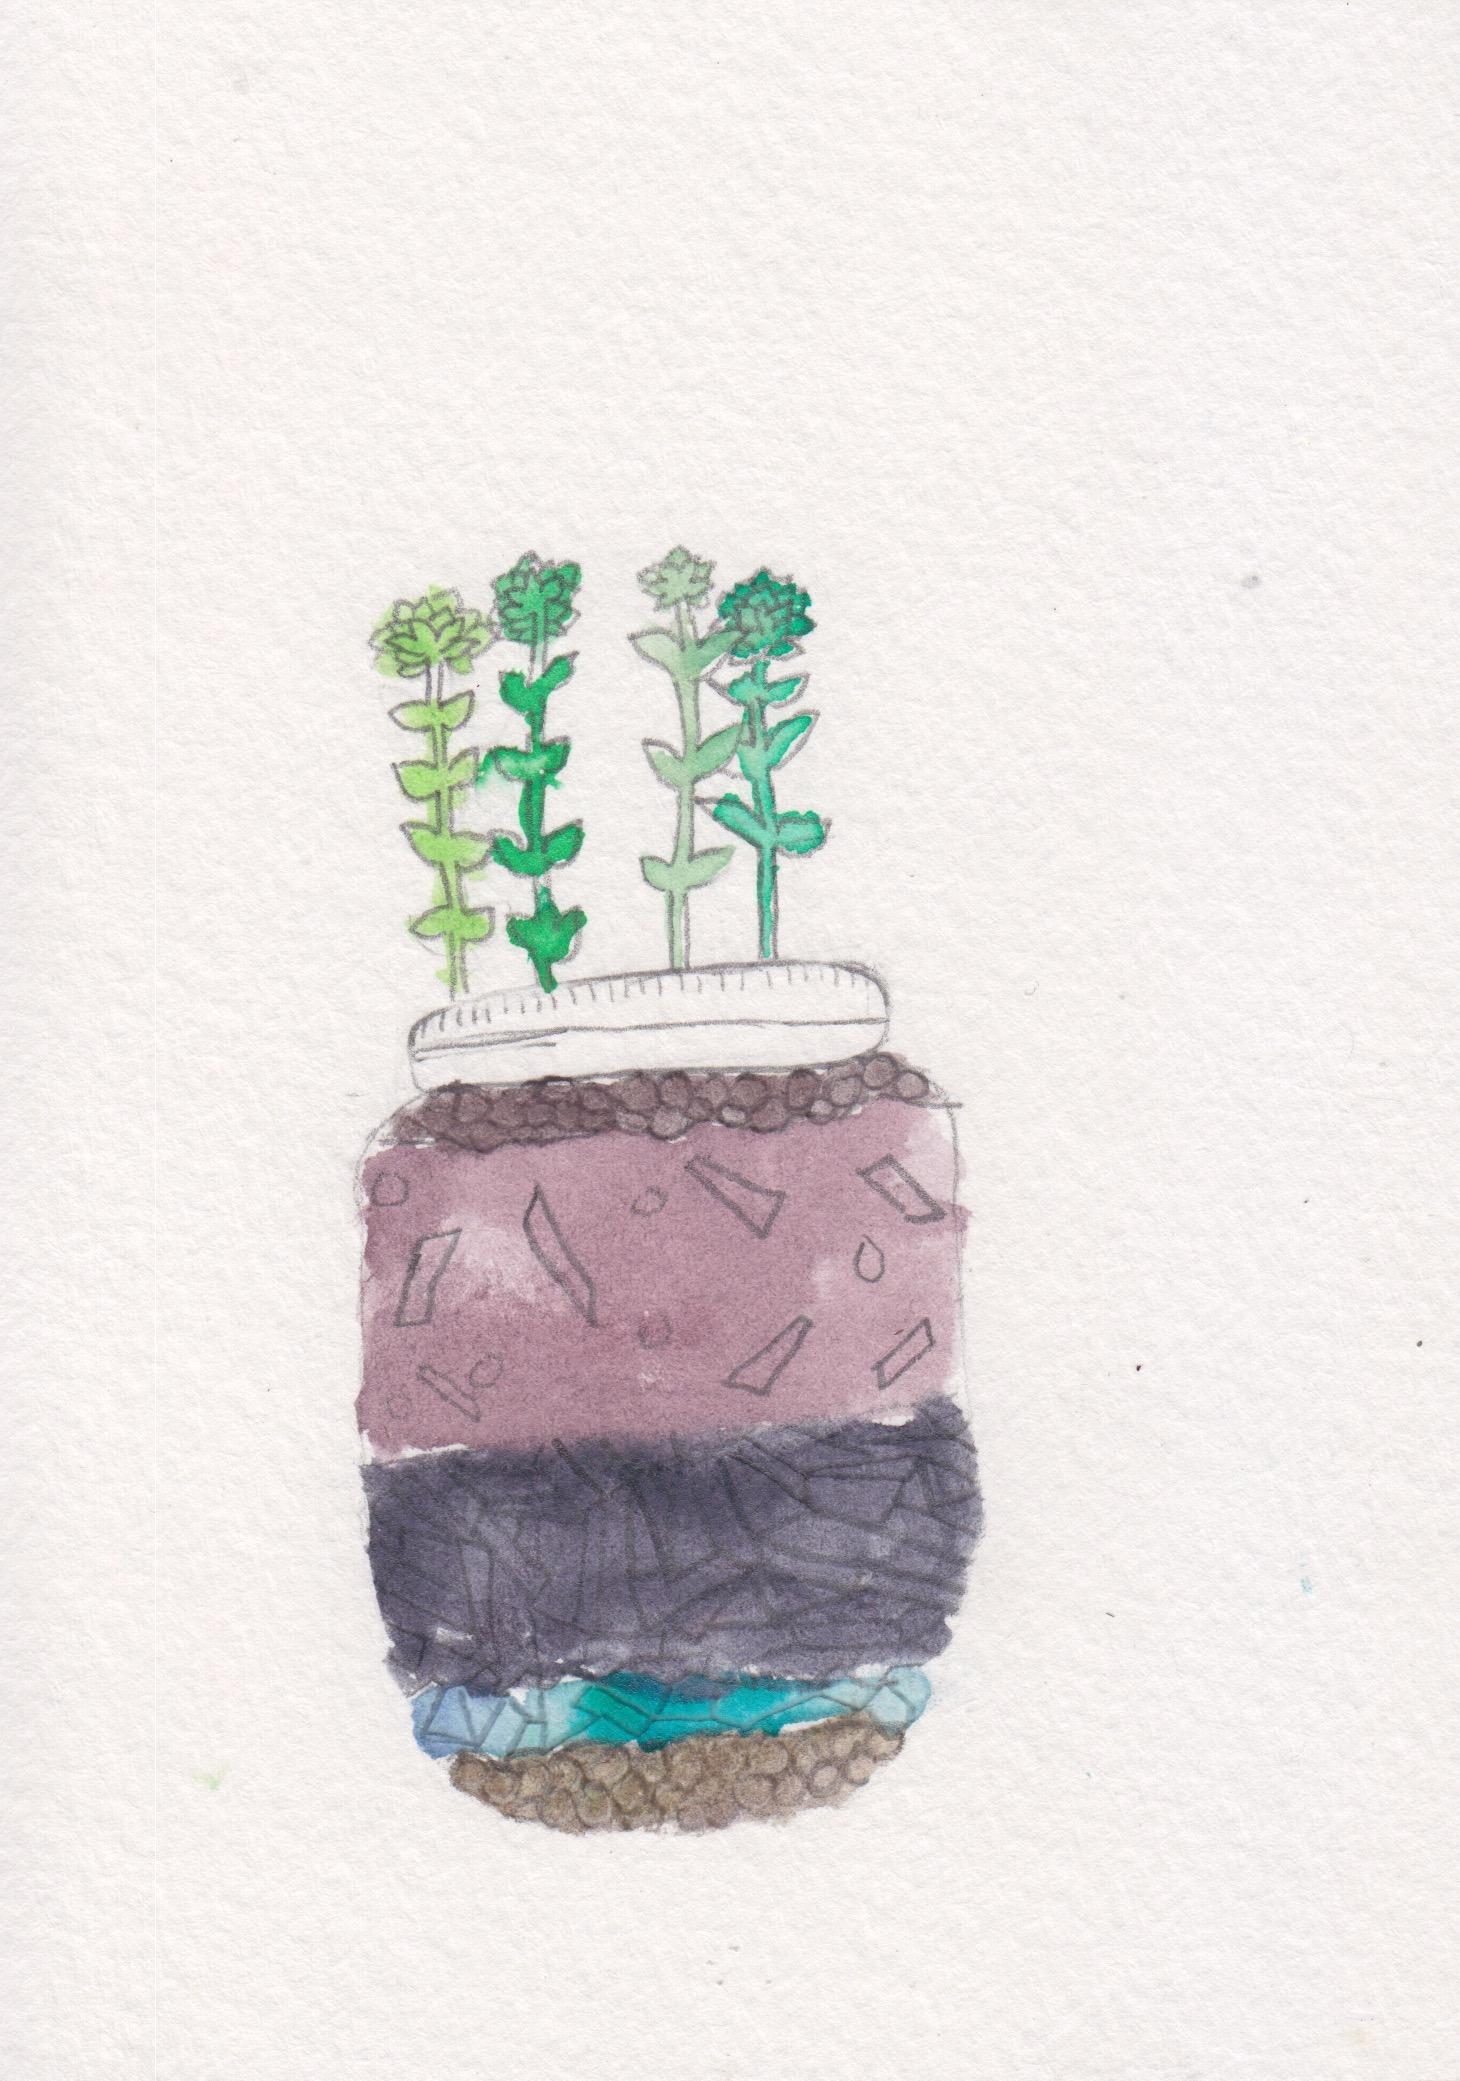 centro_watercolor terrarium_MariaRamos02.jpeg